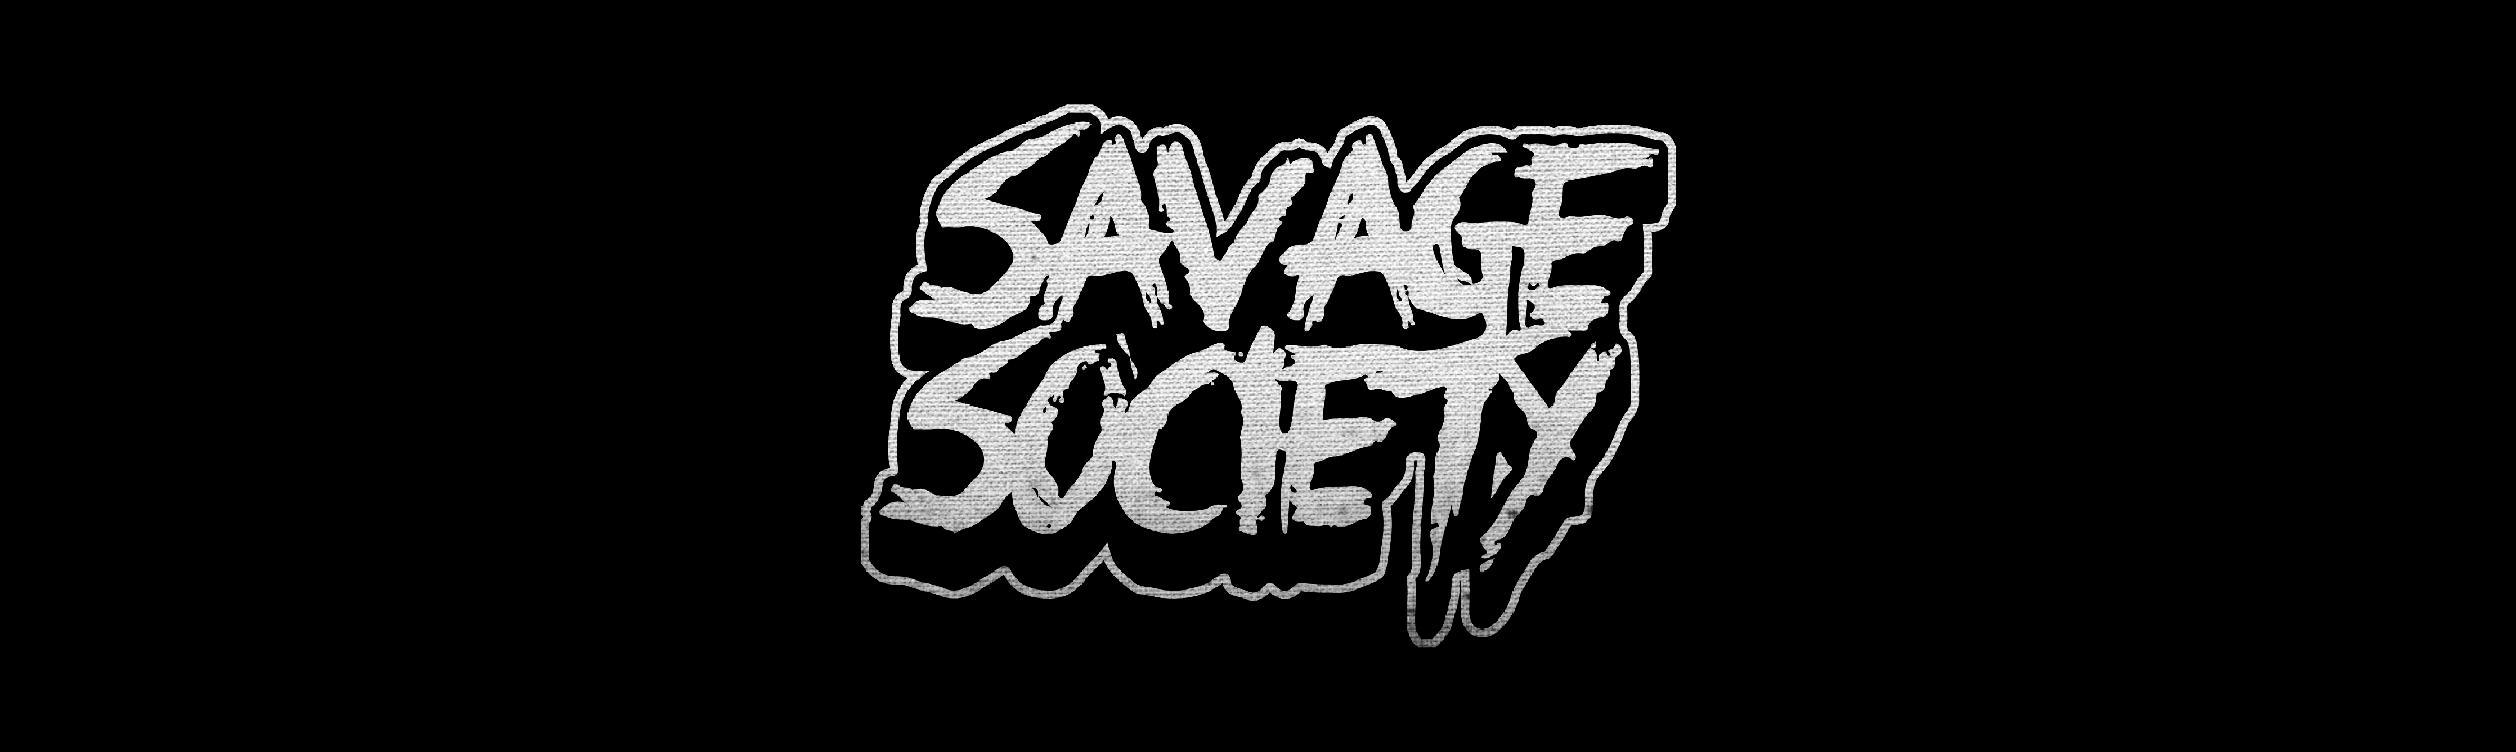 Home Savage Society Records